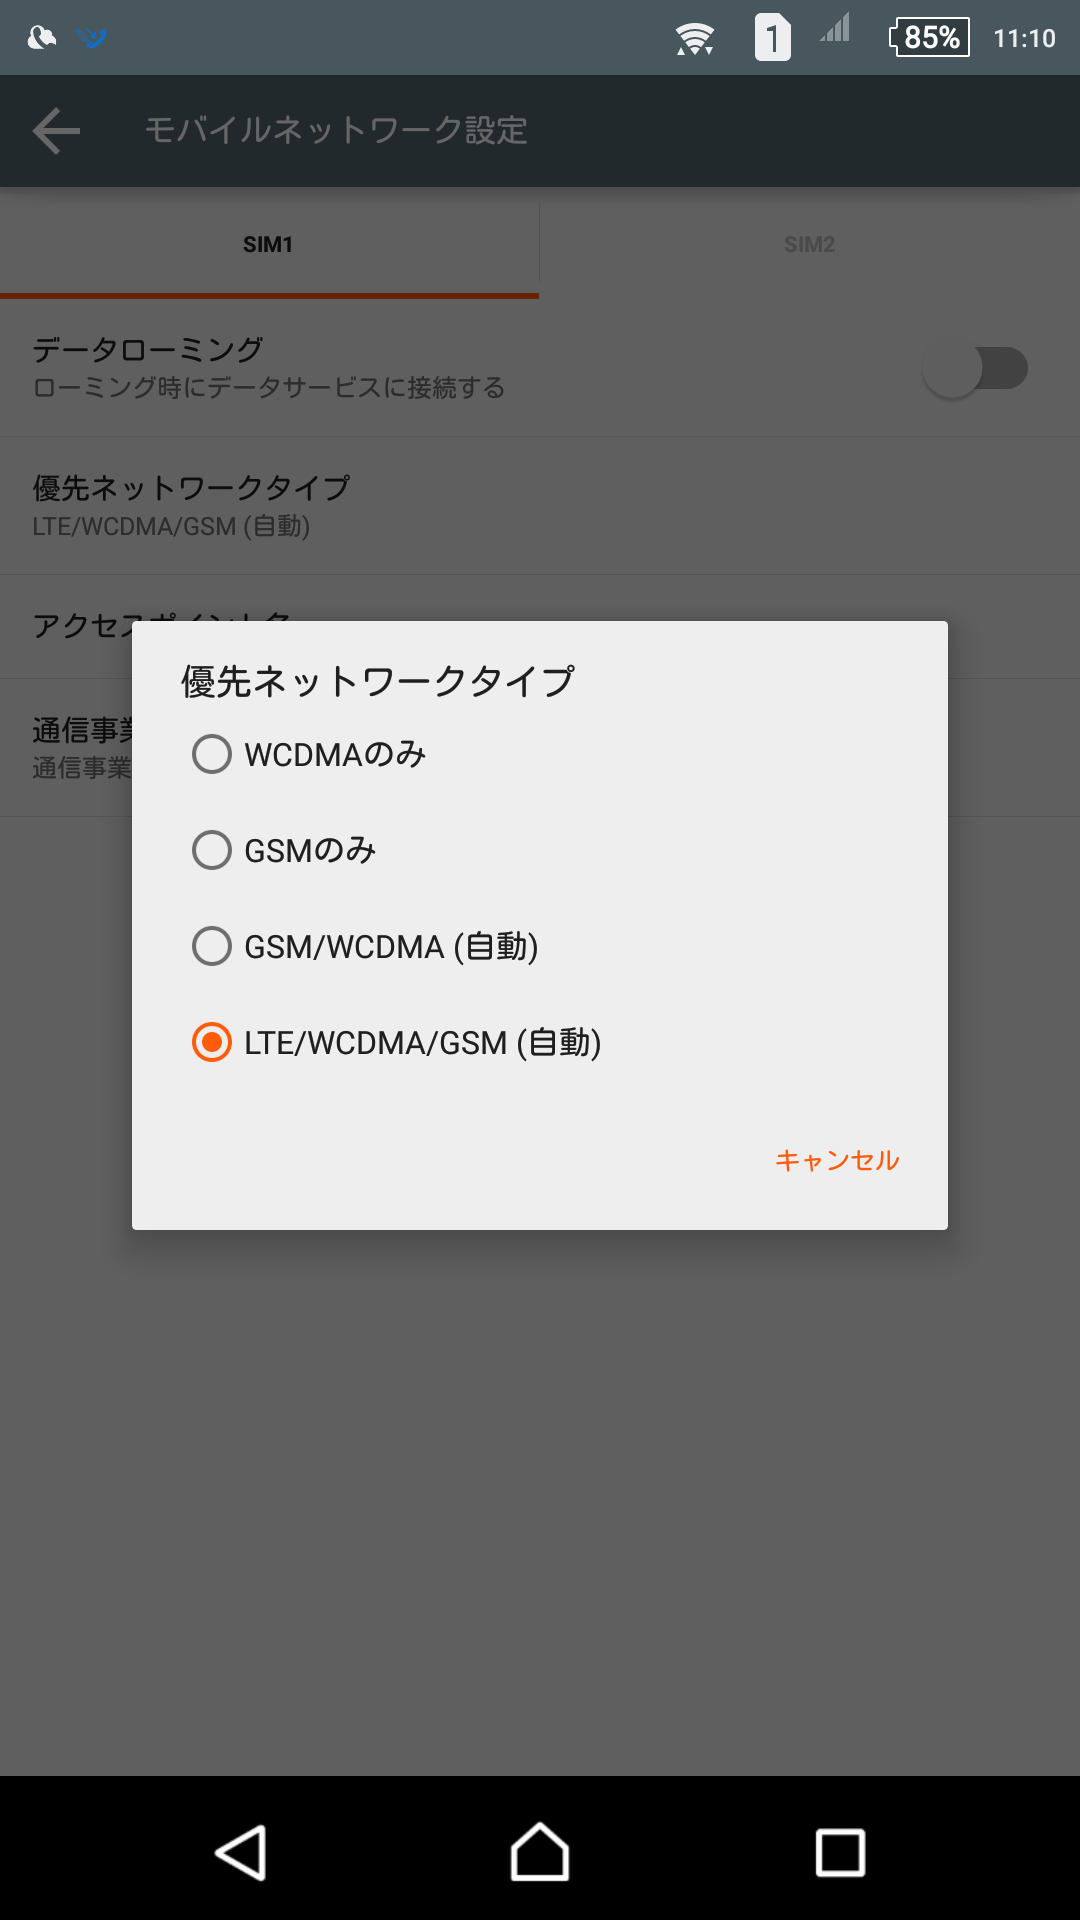 【Xperia C5 Ultra】mopera U契約+脱らくらくフォン+DualSIMは使える?